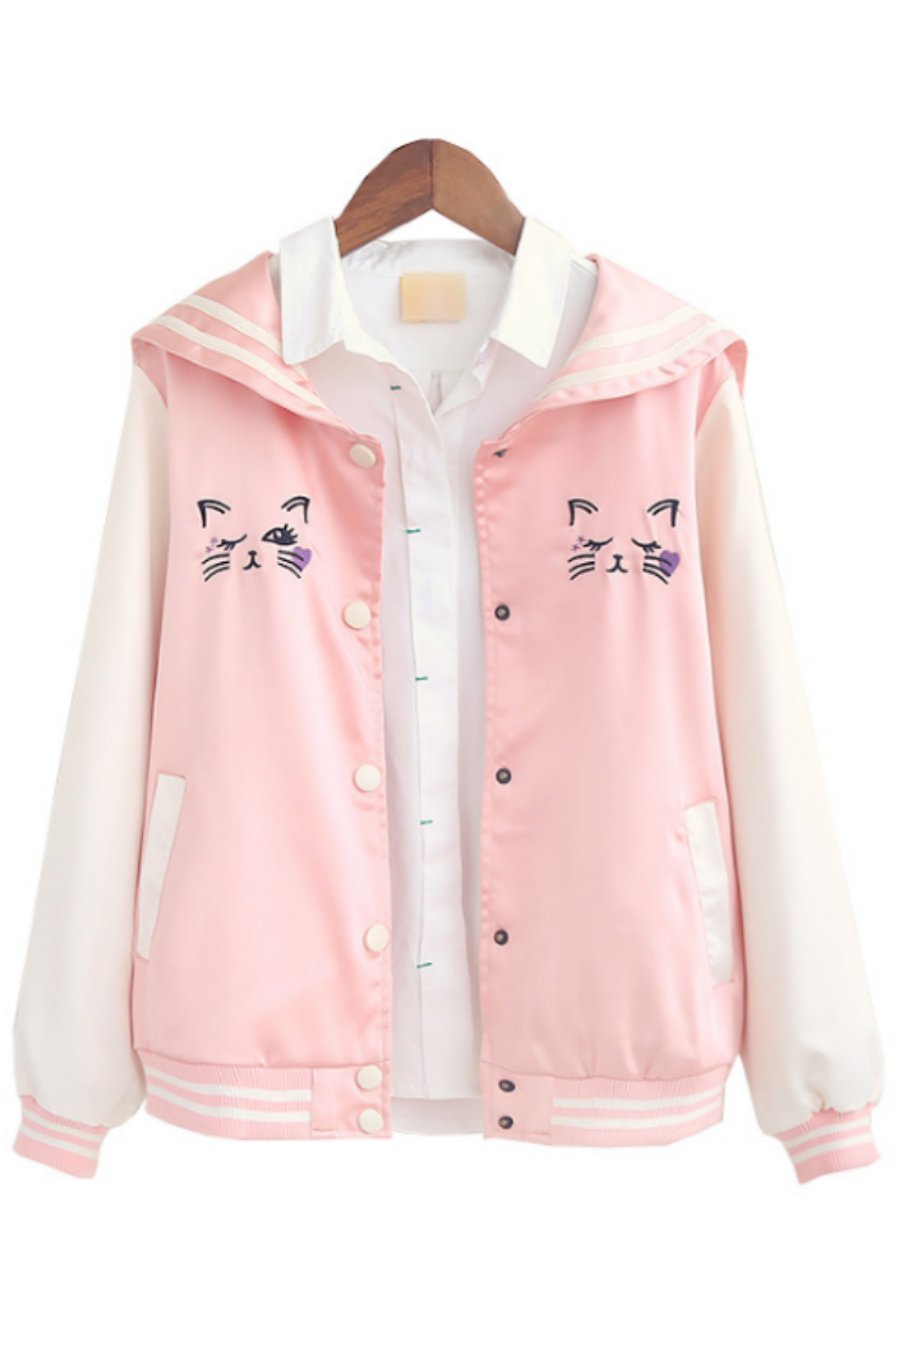 korean fashion sweet pastel fleece hoodie from Cute Kawaii {harajuku fashion}